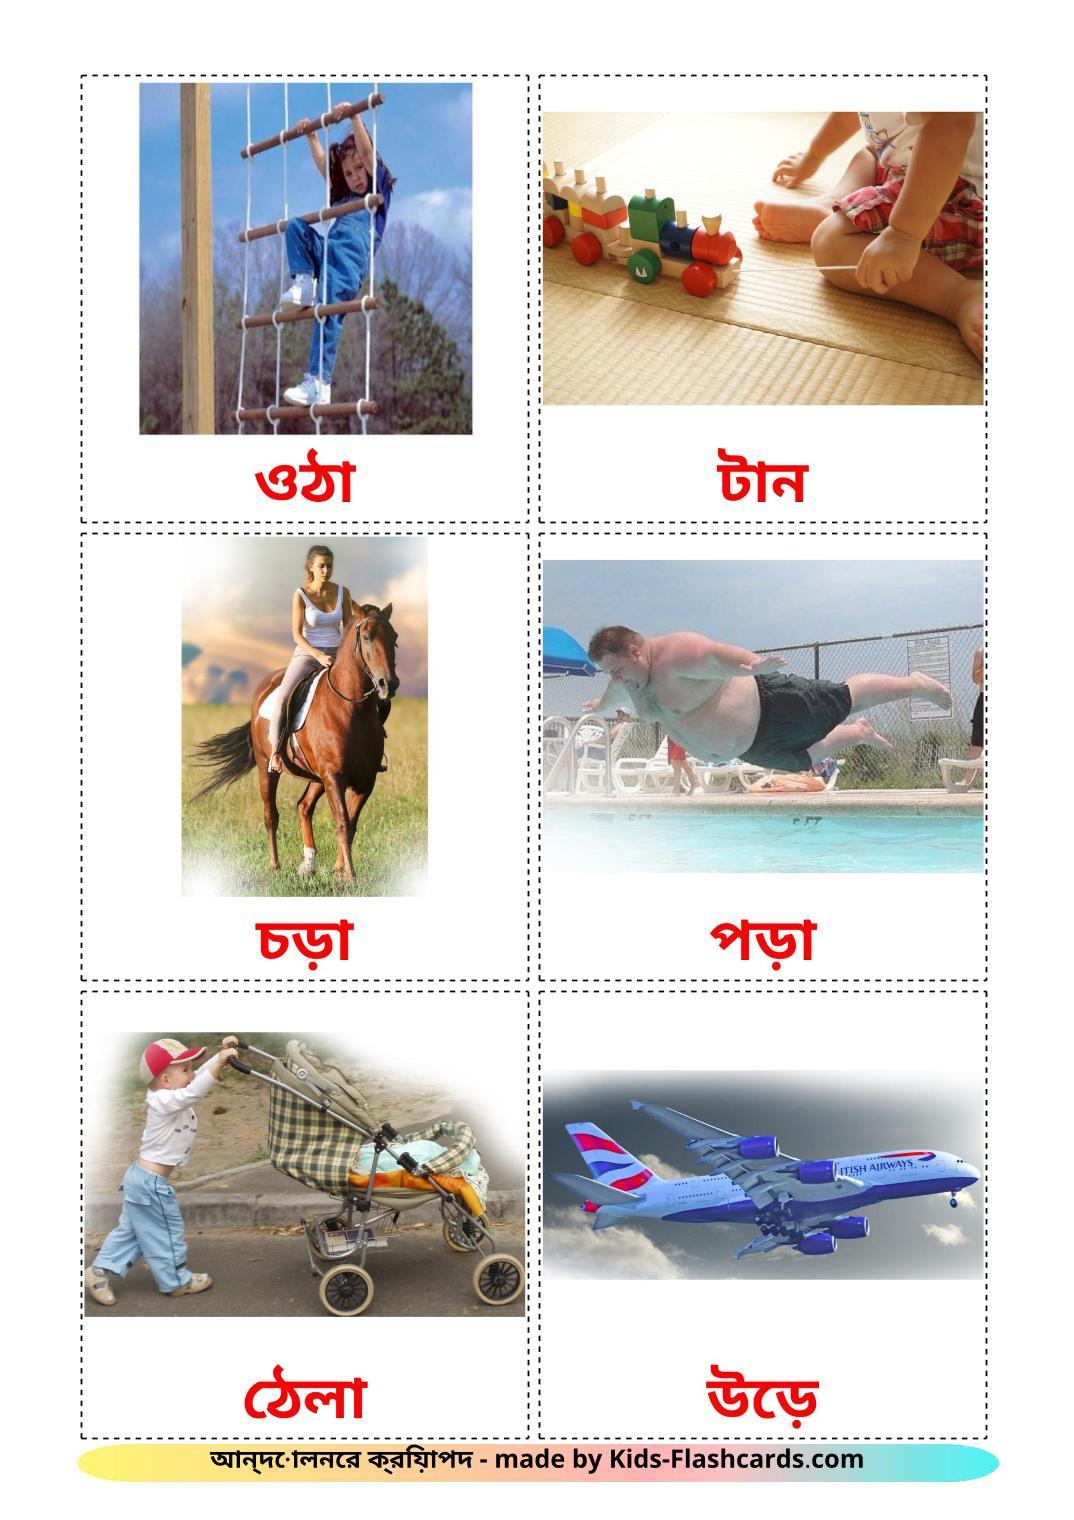 Movement verbs - 22 Free Printable bengali Flashcards